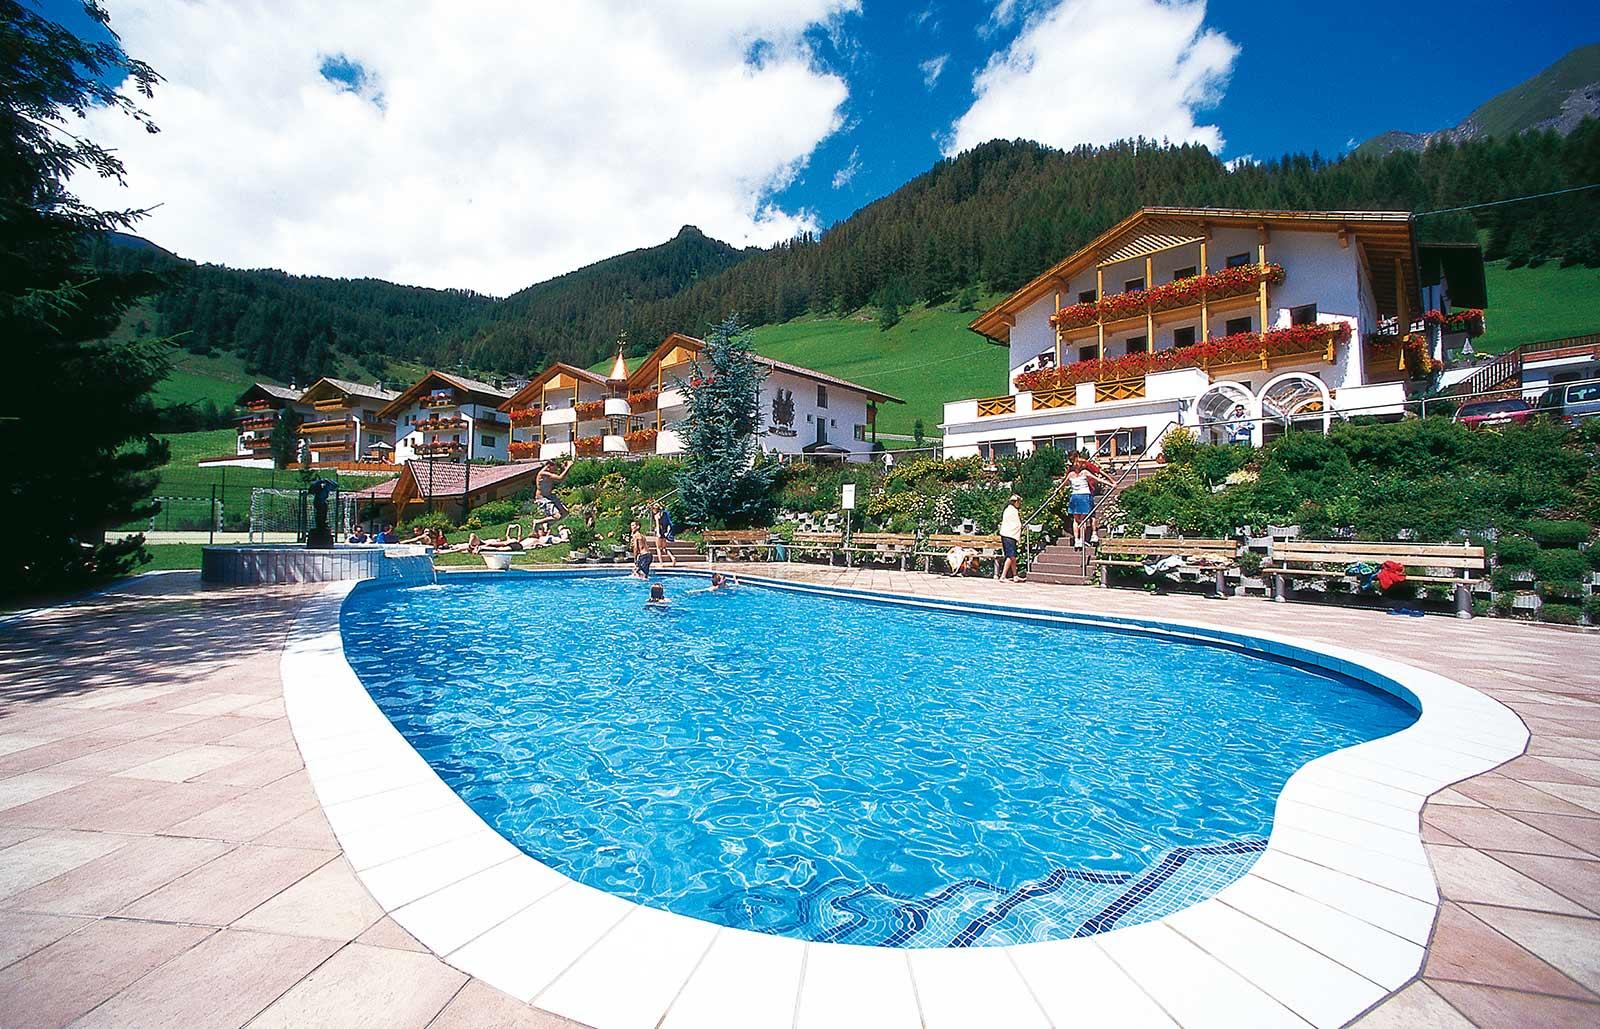 Hotel in valle aurina con piscina - Hotel in montagna con piscina ...